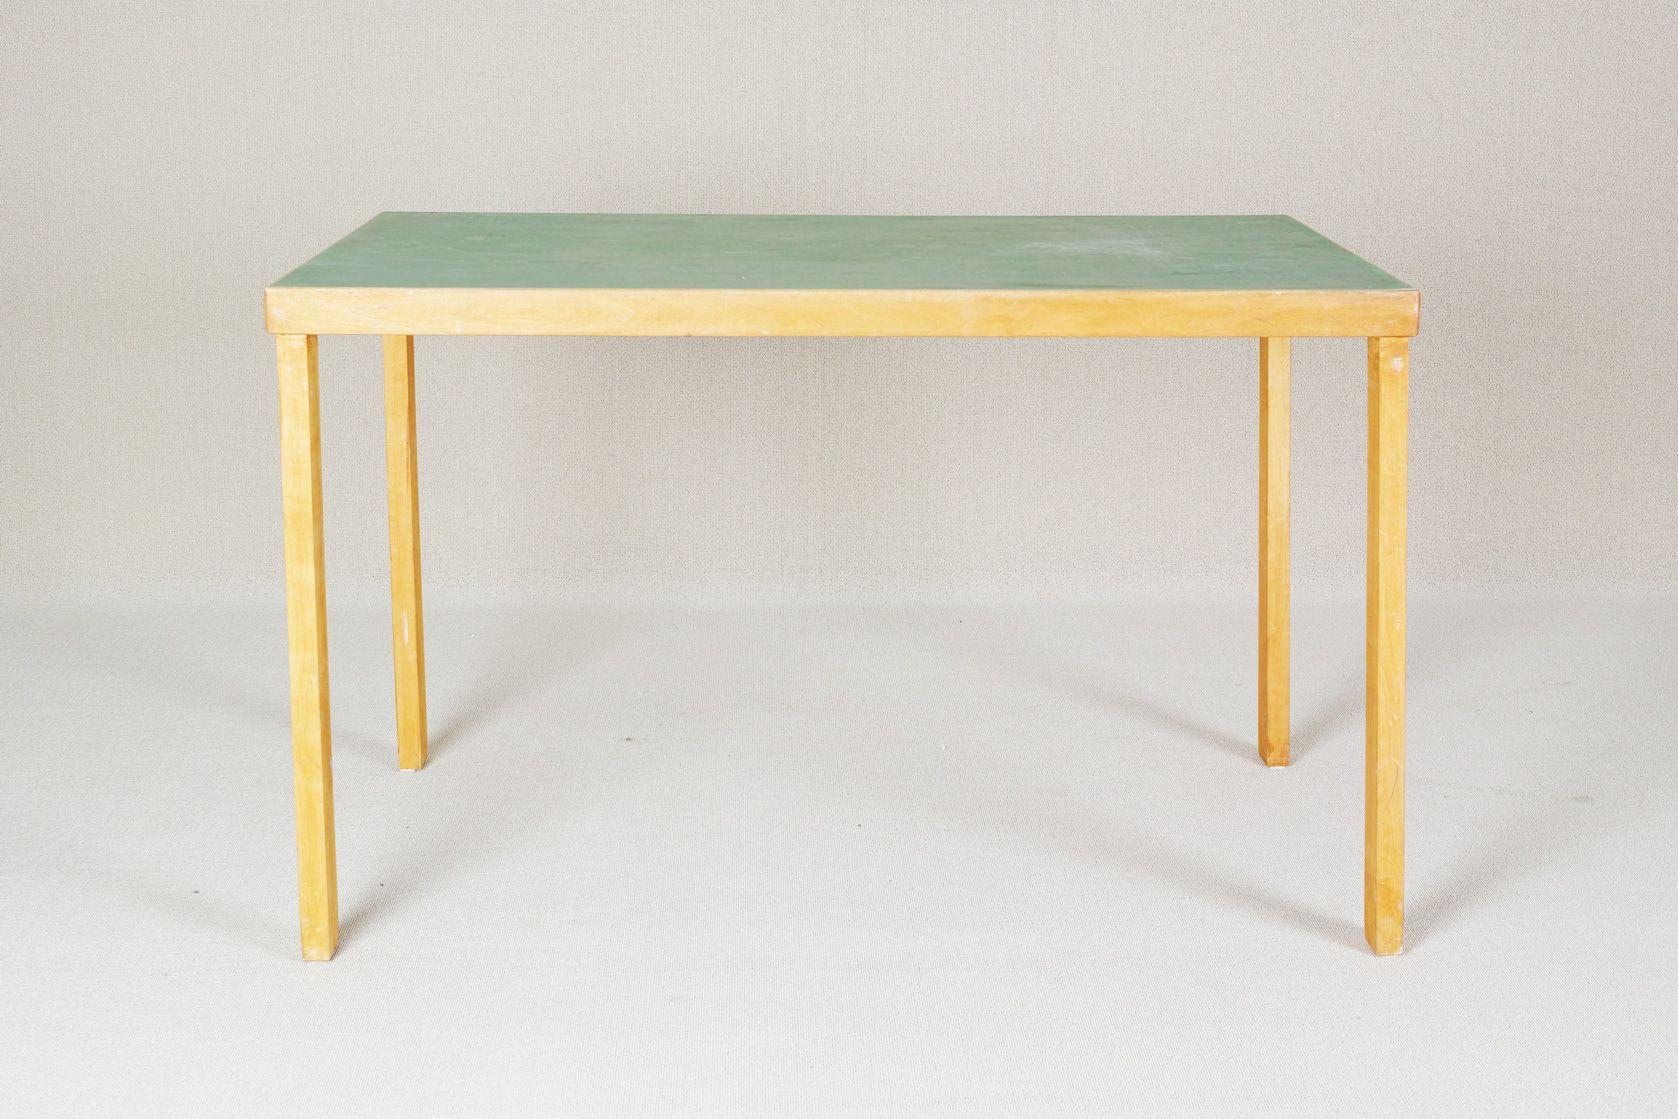 Vintage straight leg table by alvar aalto for huonekalu ja vintage straight leg table by alvar aalto for huonekalu ja rakennustytehdas watchthetrailerfo